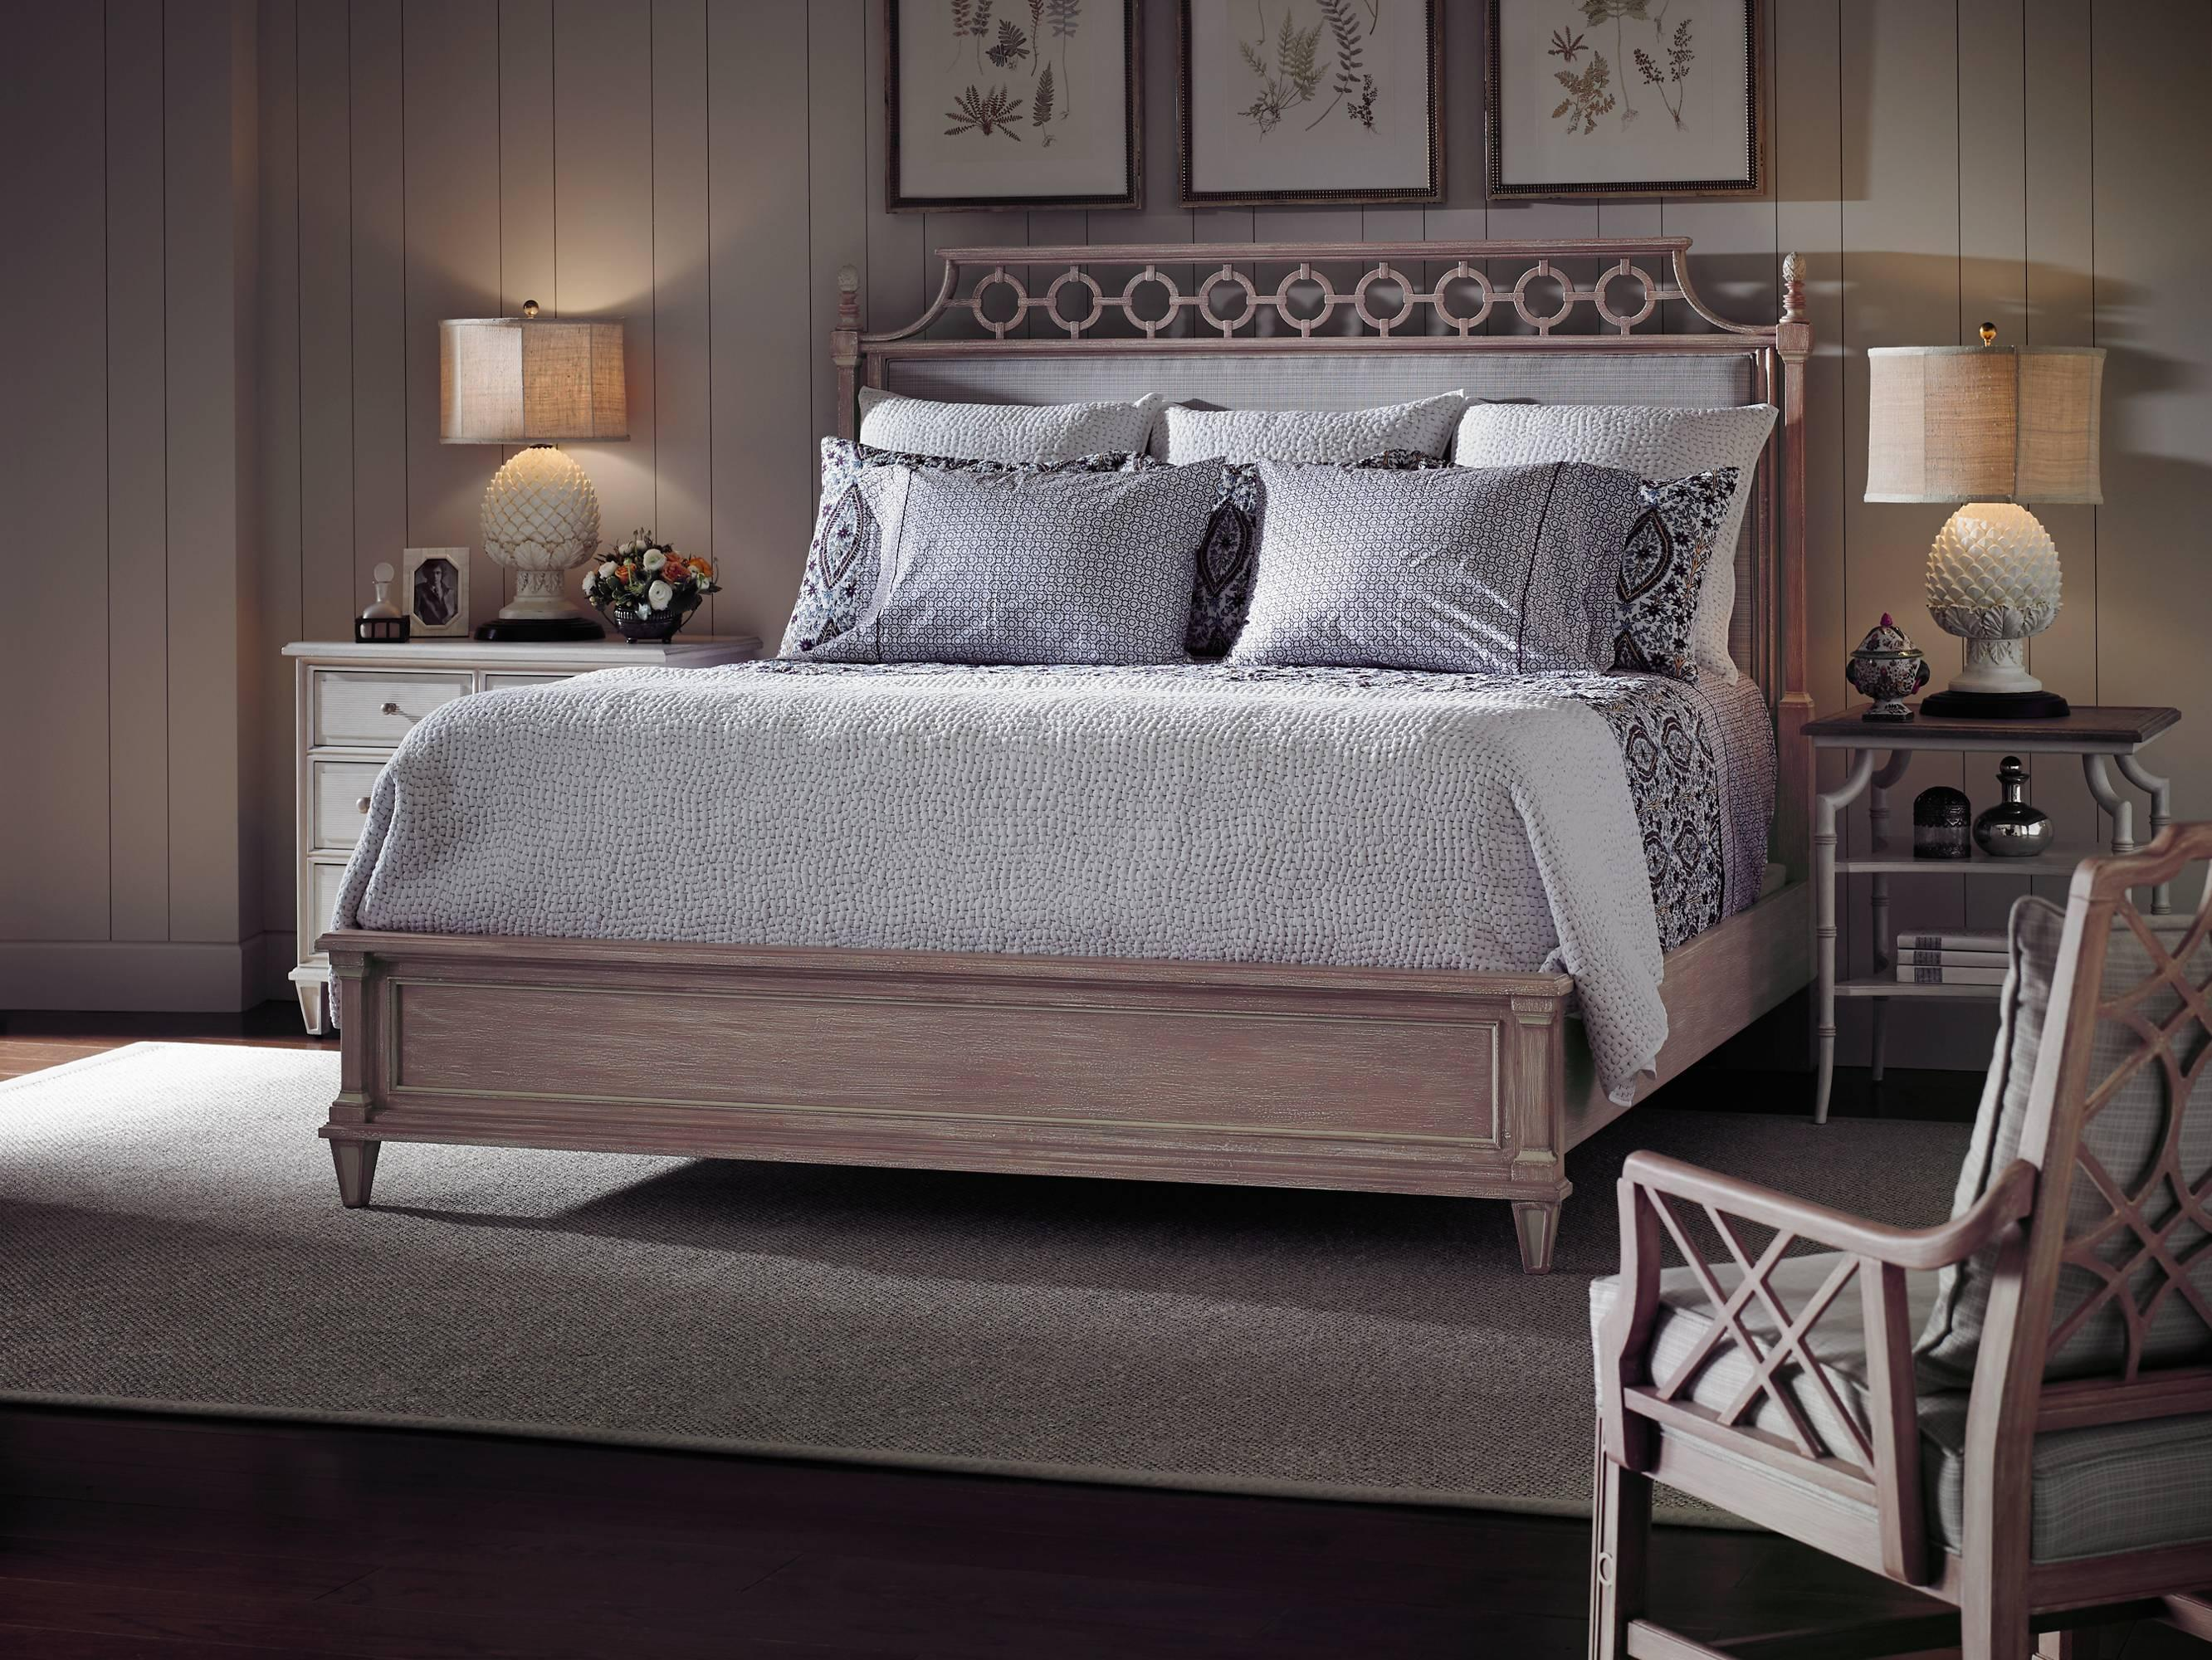 Stanley Furniture Preserve Beaufort Bachelor Chest Jacksonville Furniture Mart Night Stands